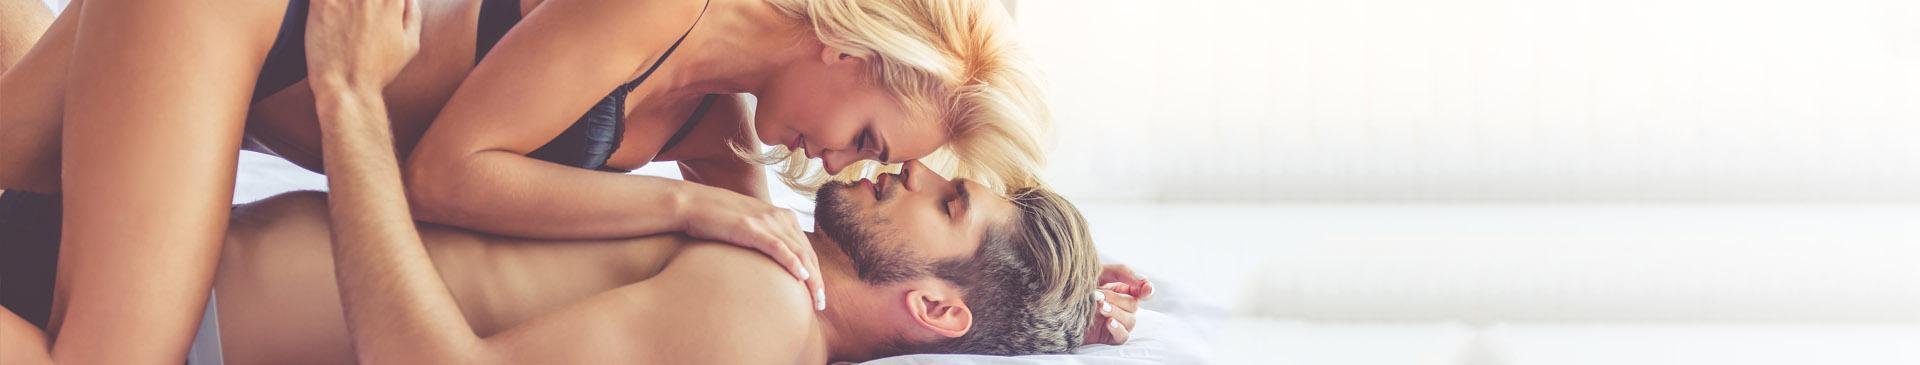 yoga en seks